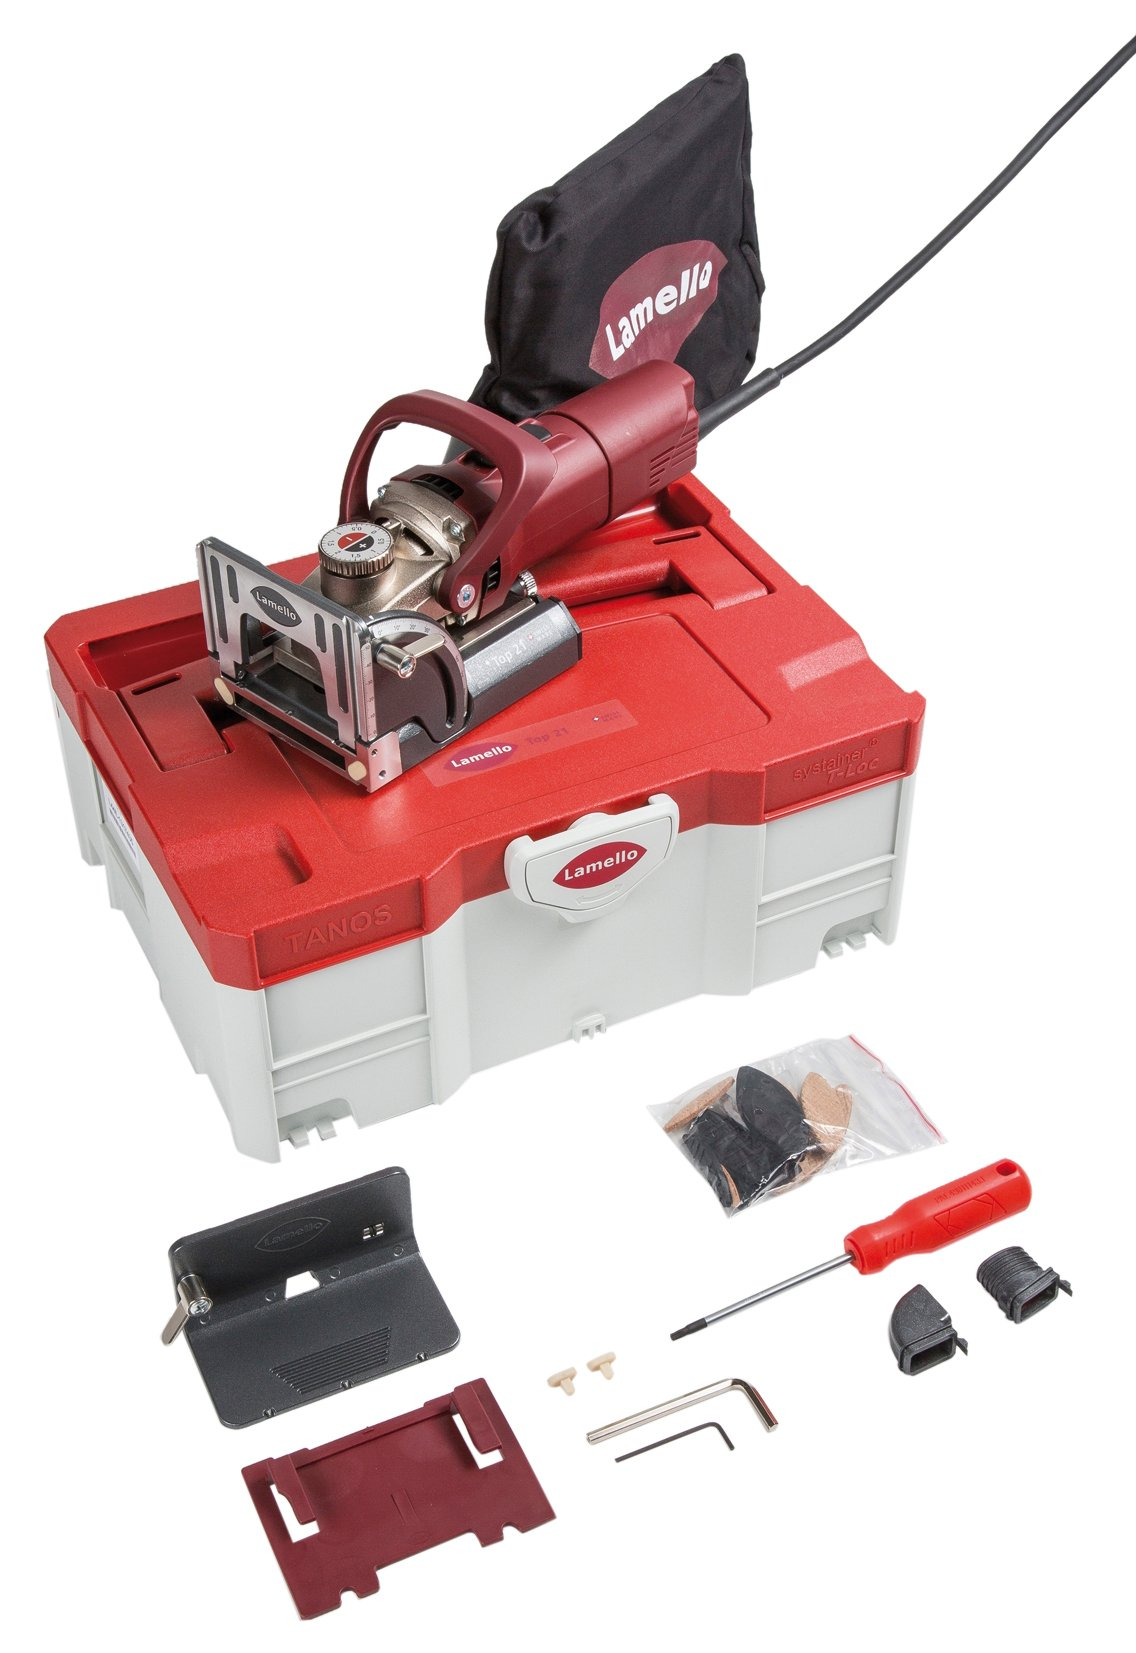 Lamello Lamello Top 21  101500 Adjustable Cutter